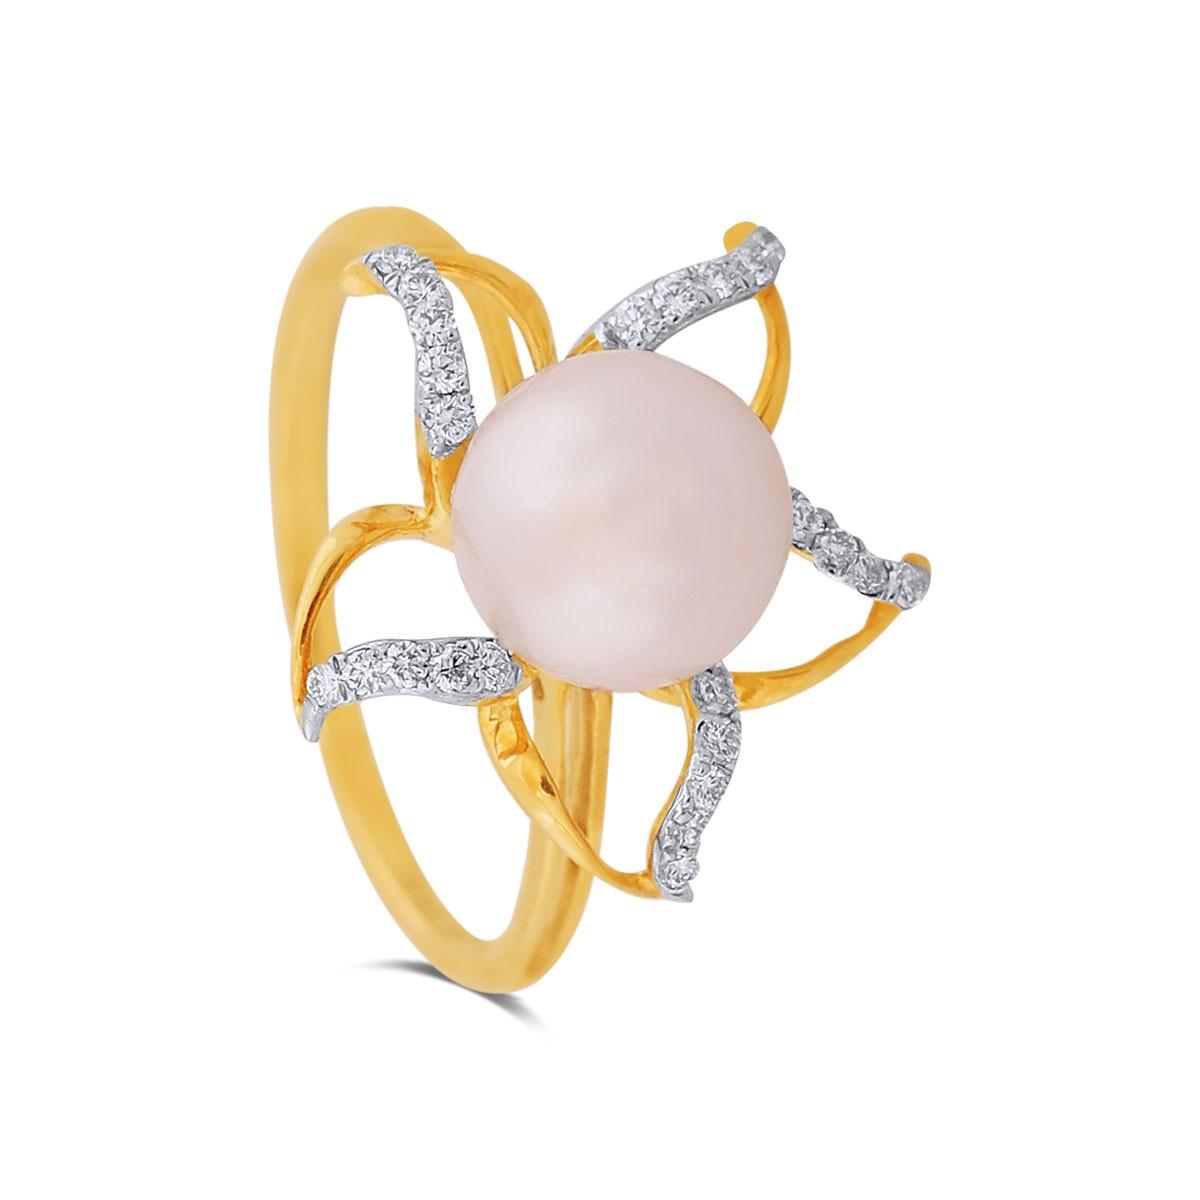 Tara Yellow Gold Diamond Ring